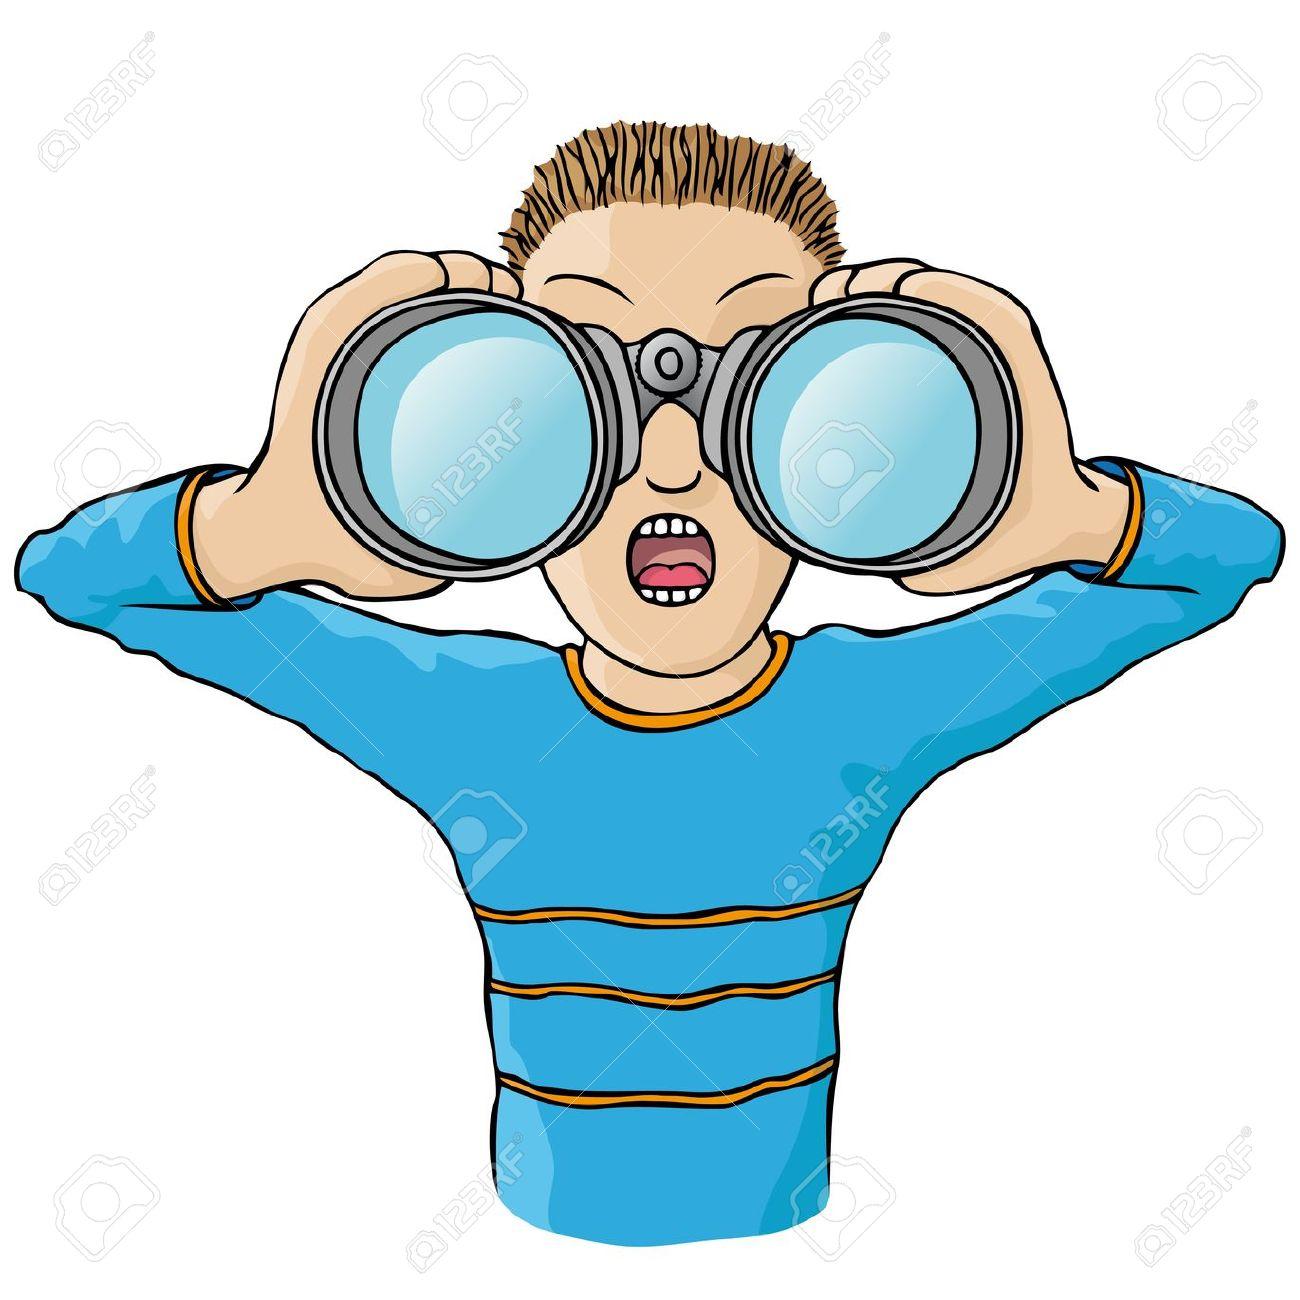 84 Binocular free clipart.